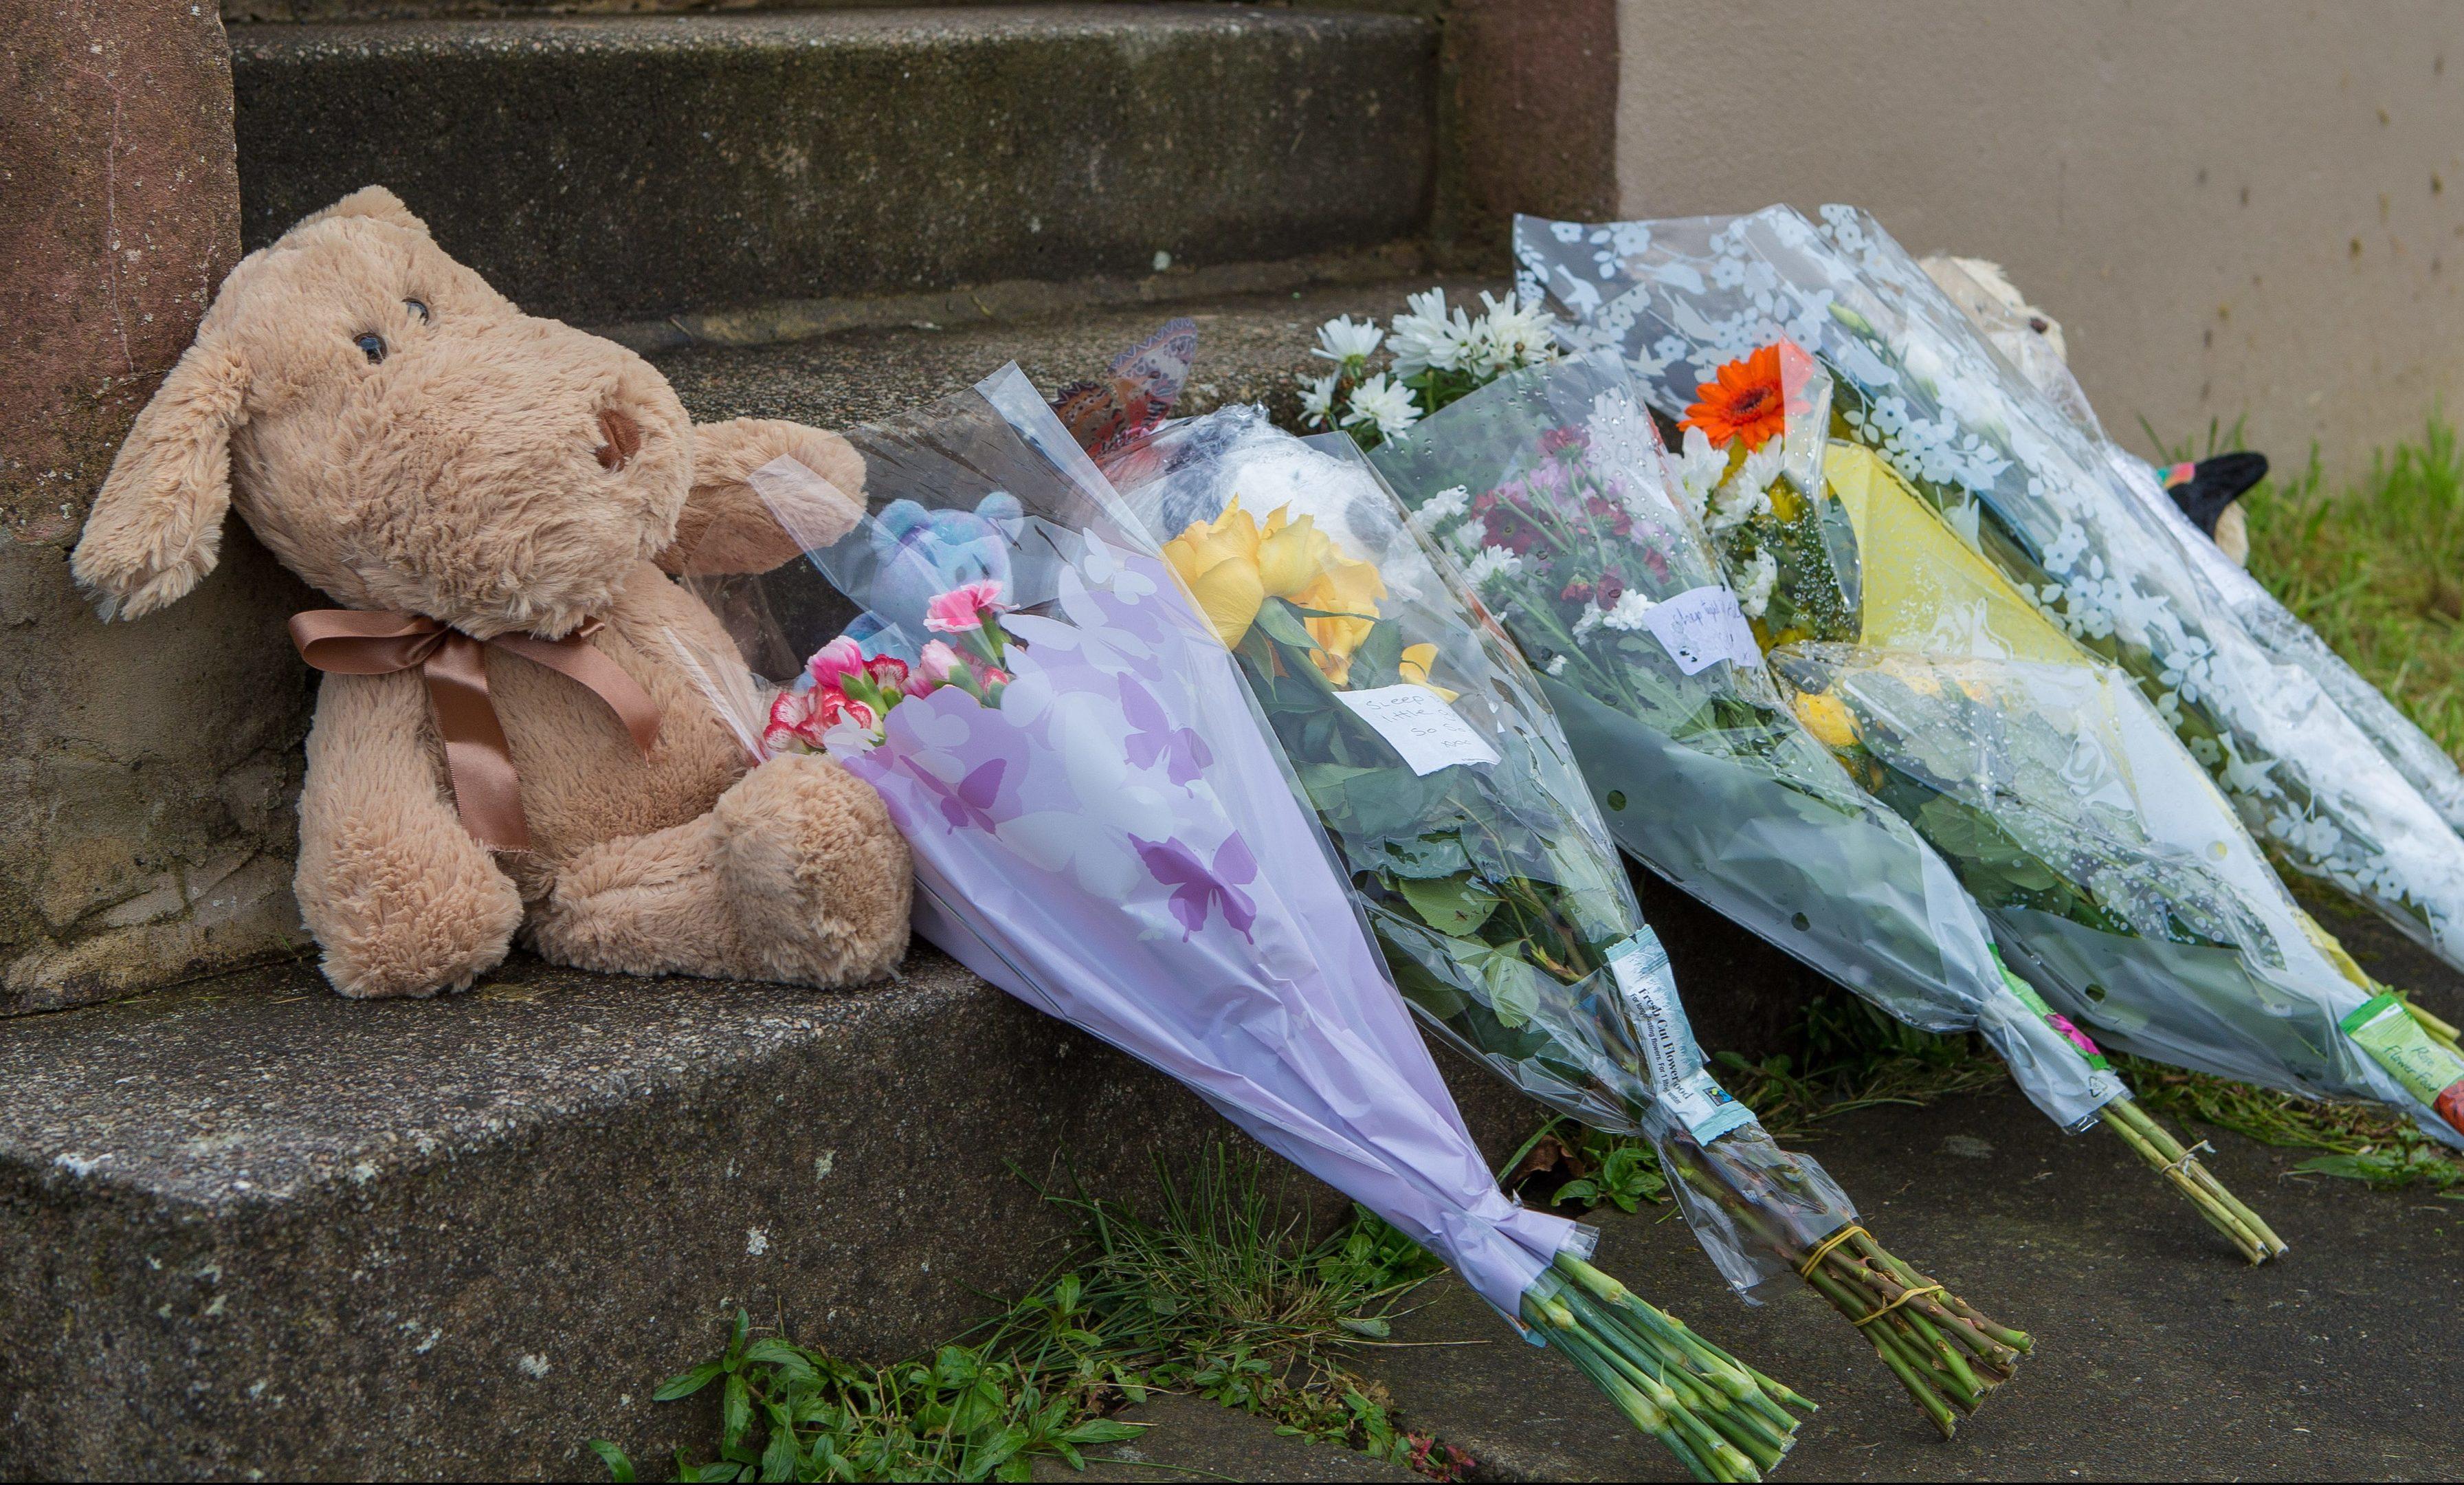 Tributes left on the doorstep.